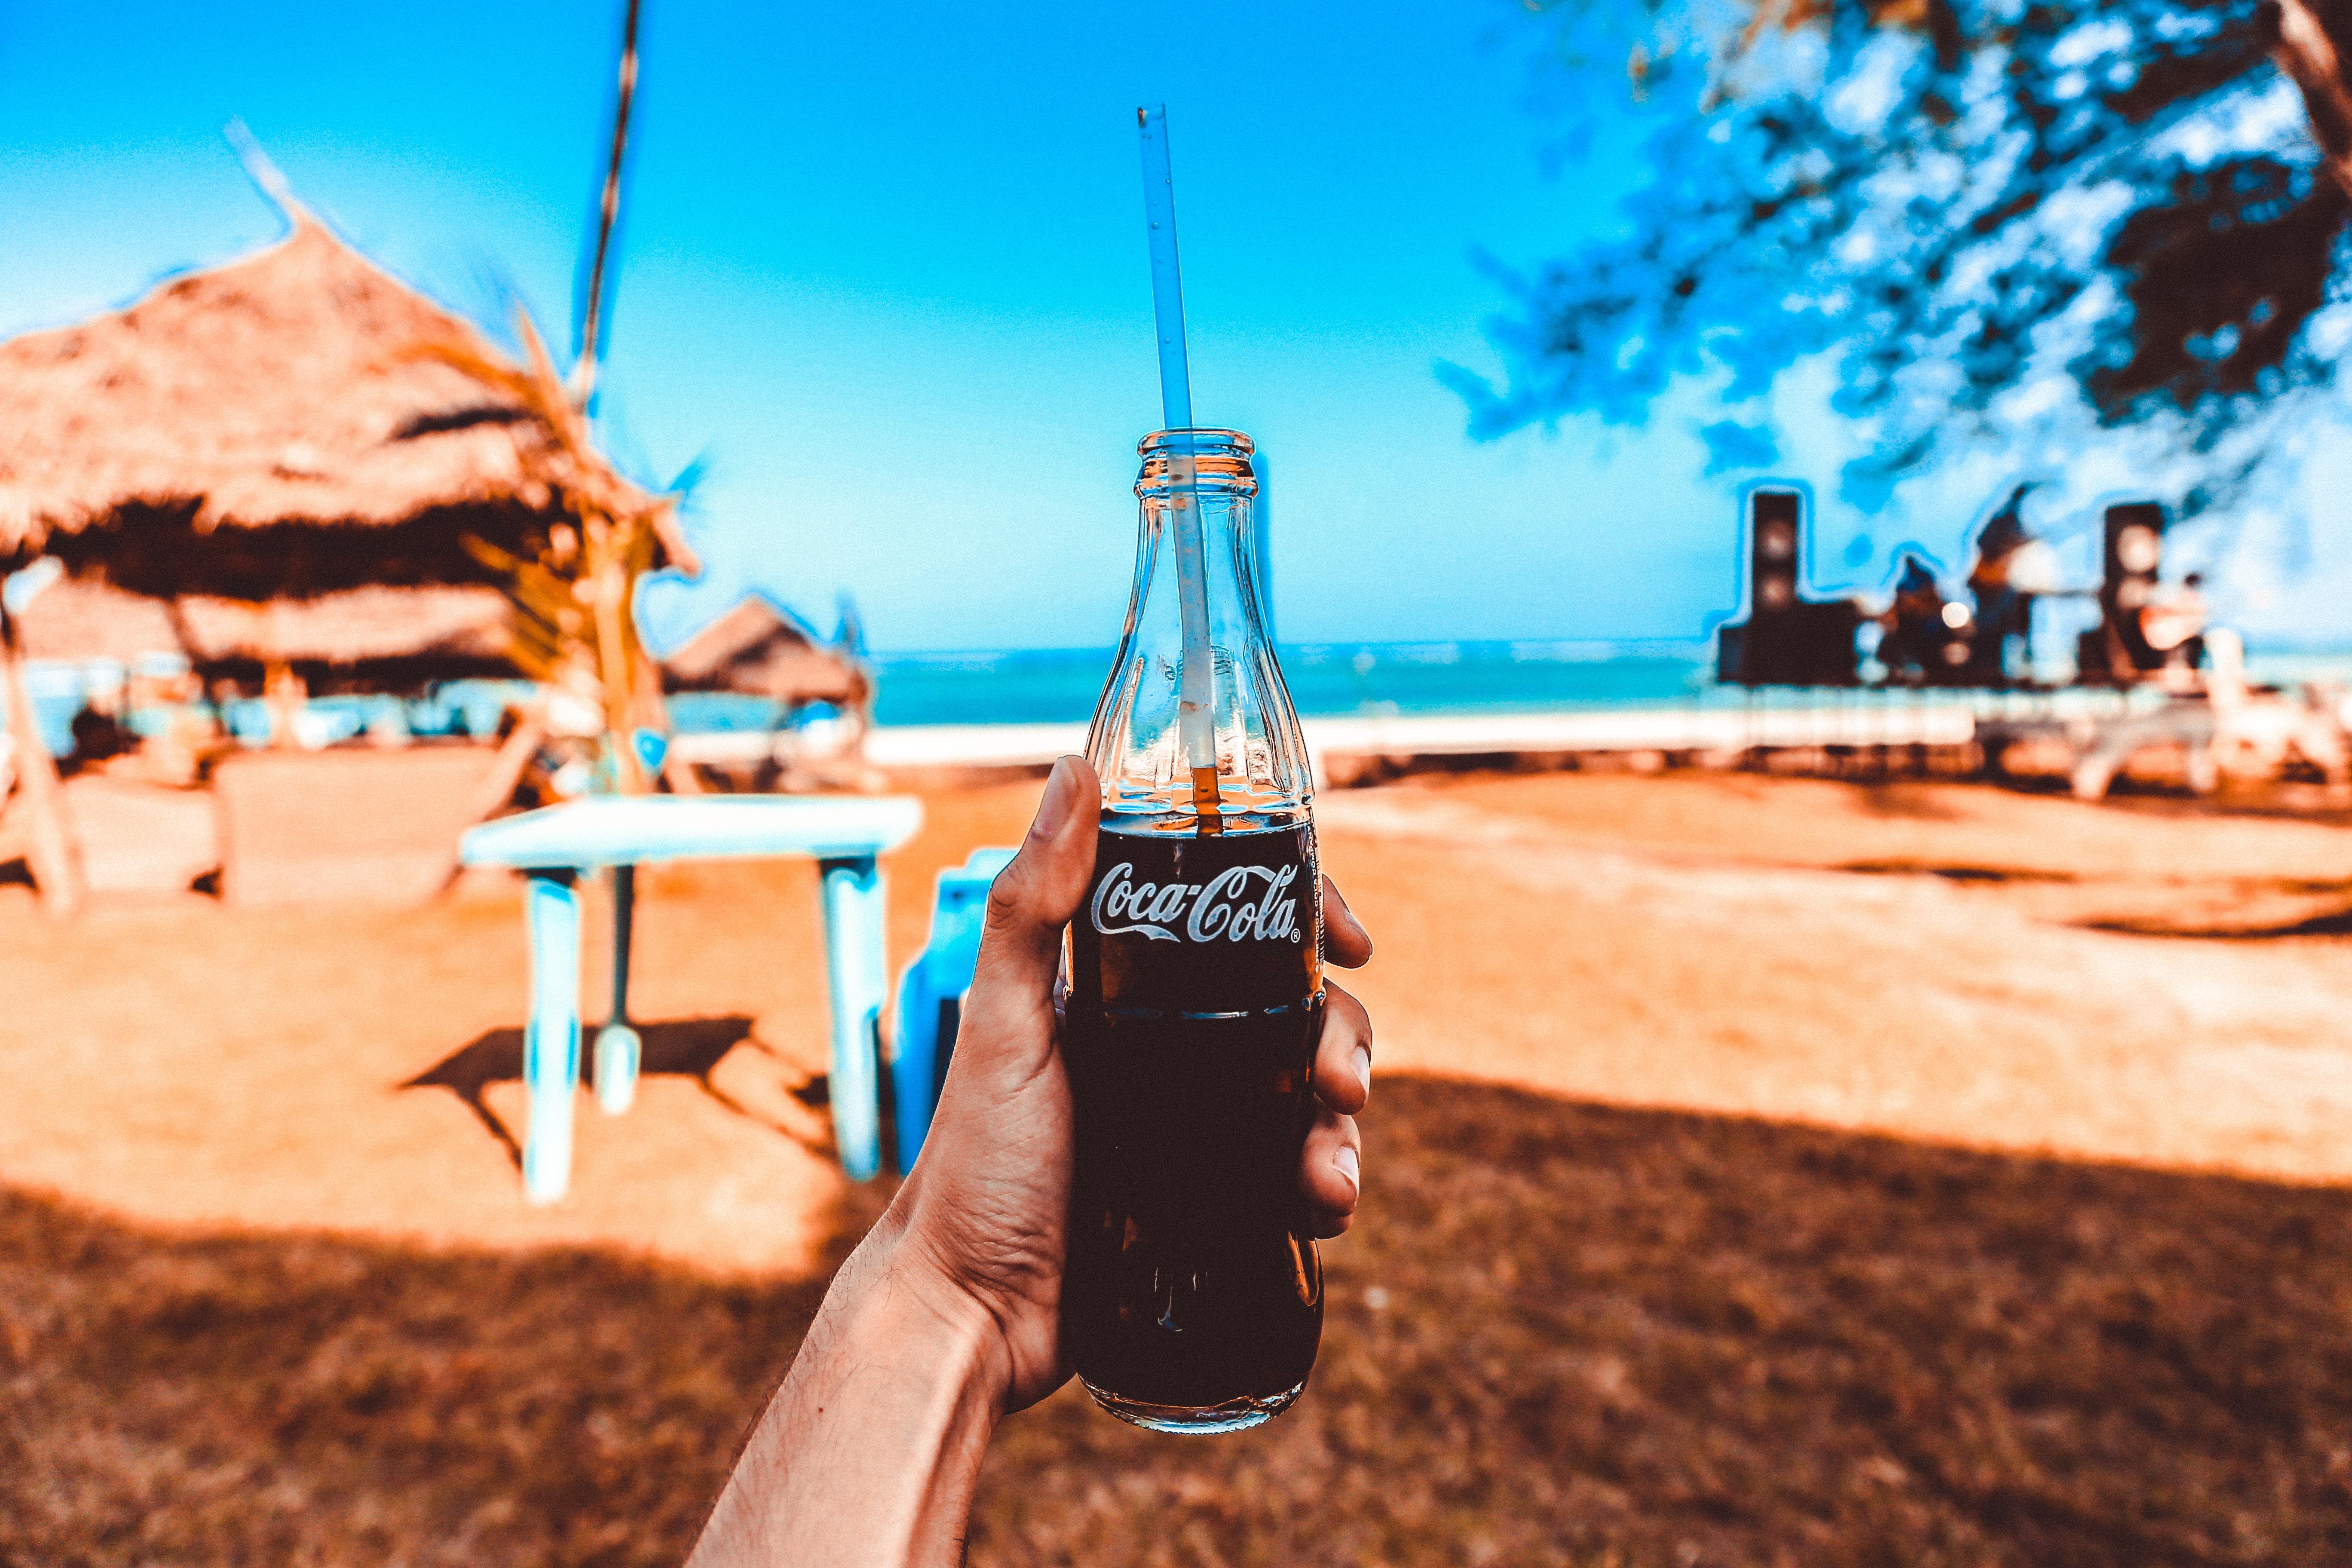 Person holding coca-cola glass bottle photo